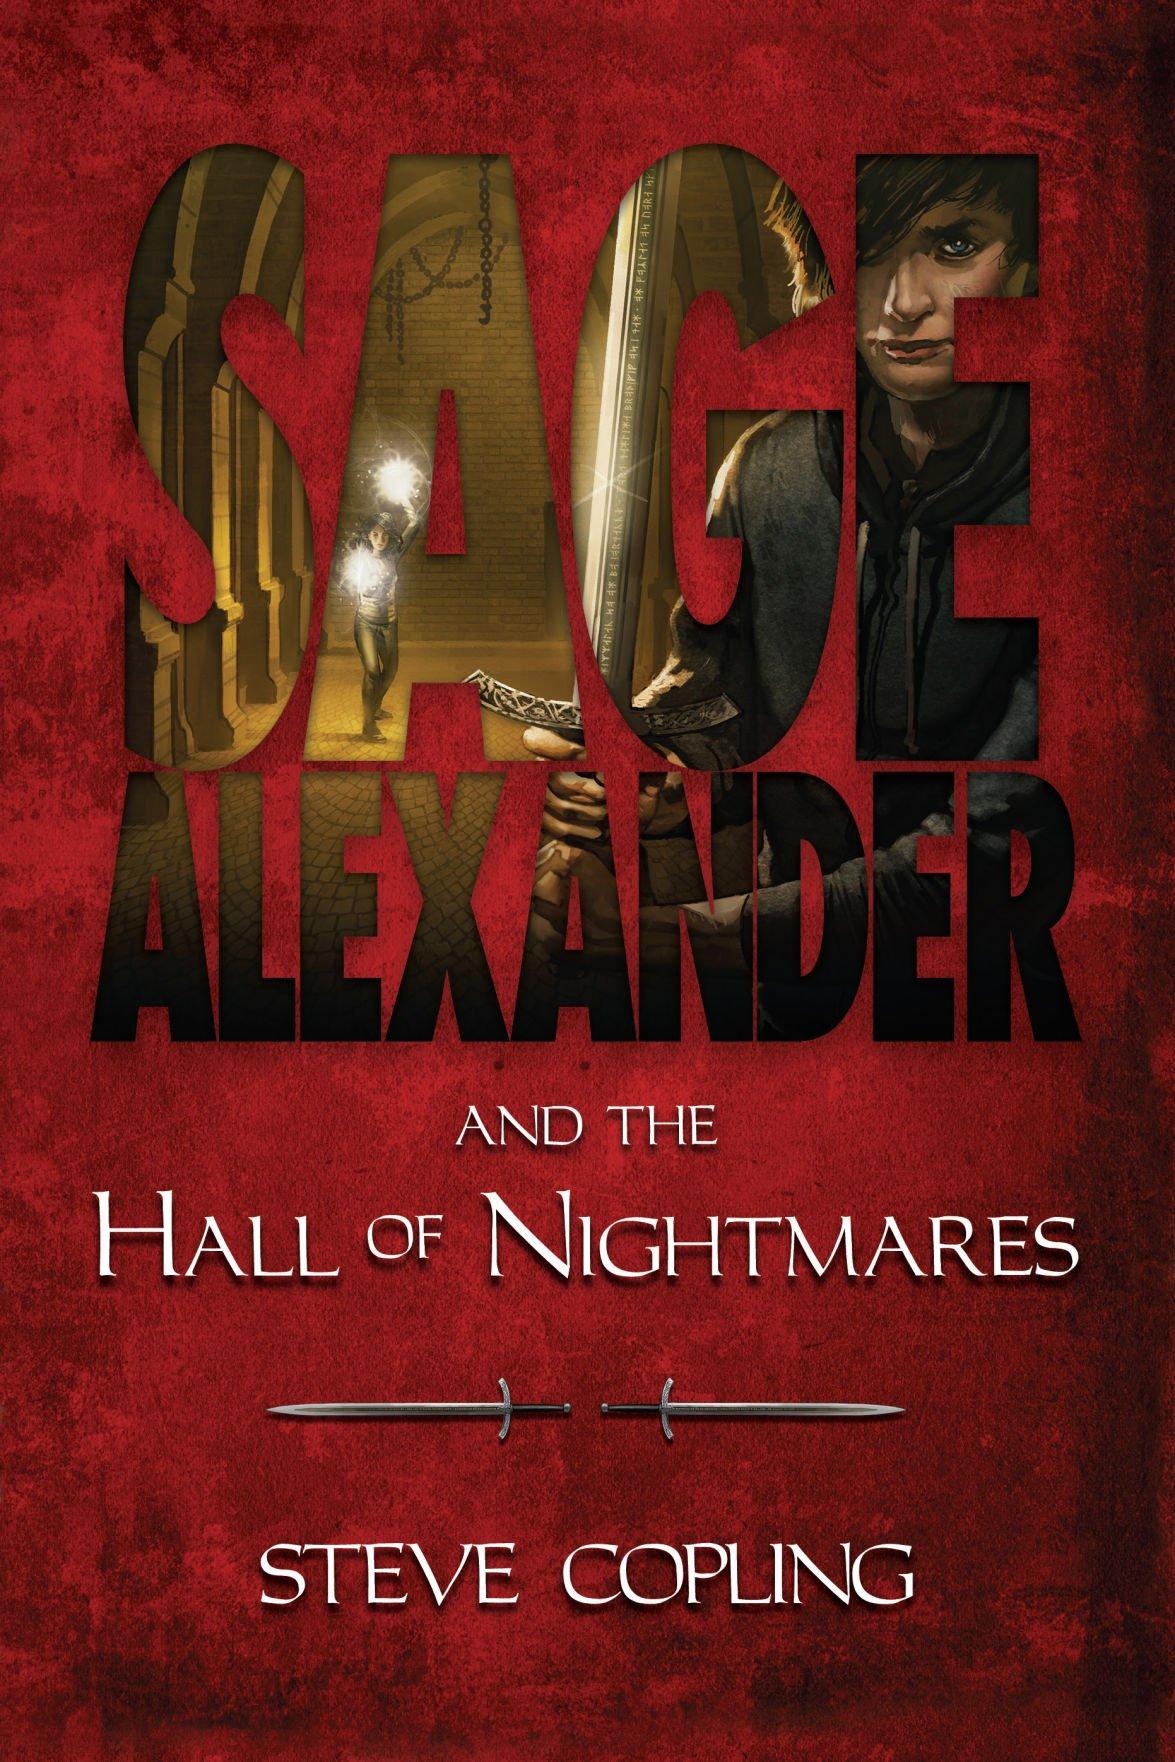 """Sage Alexander and the Hall of Nightmares"""